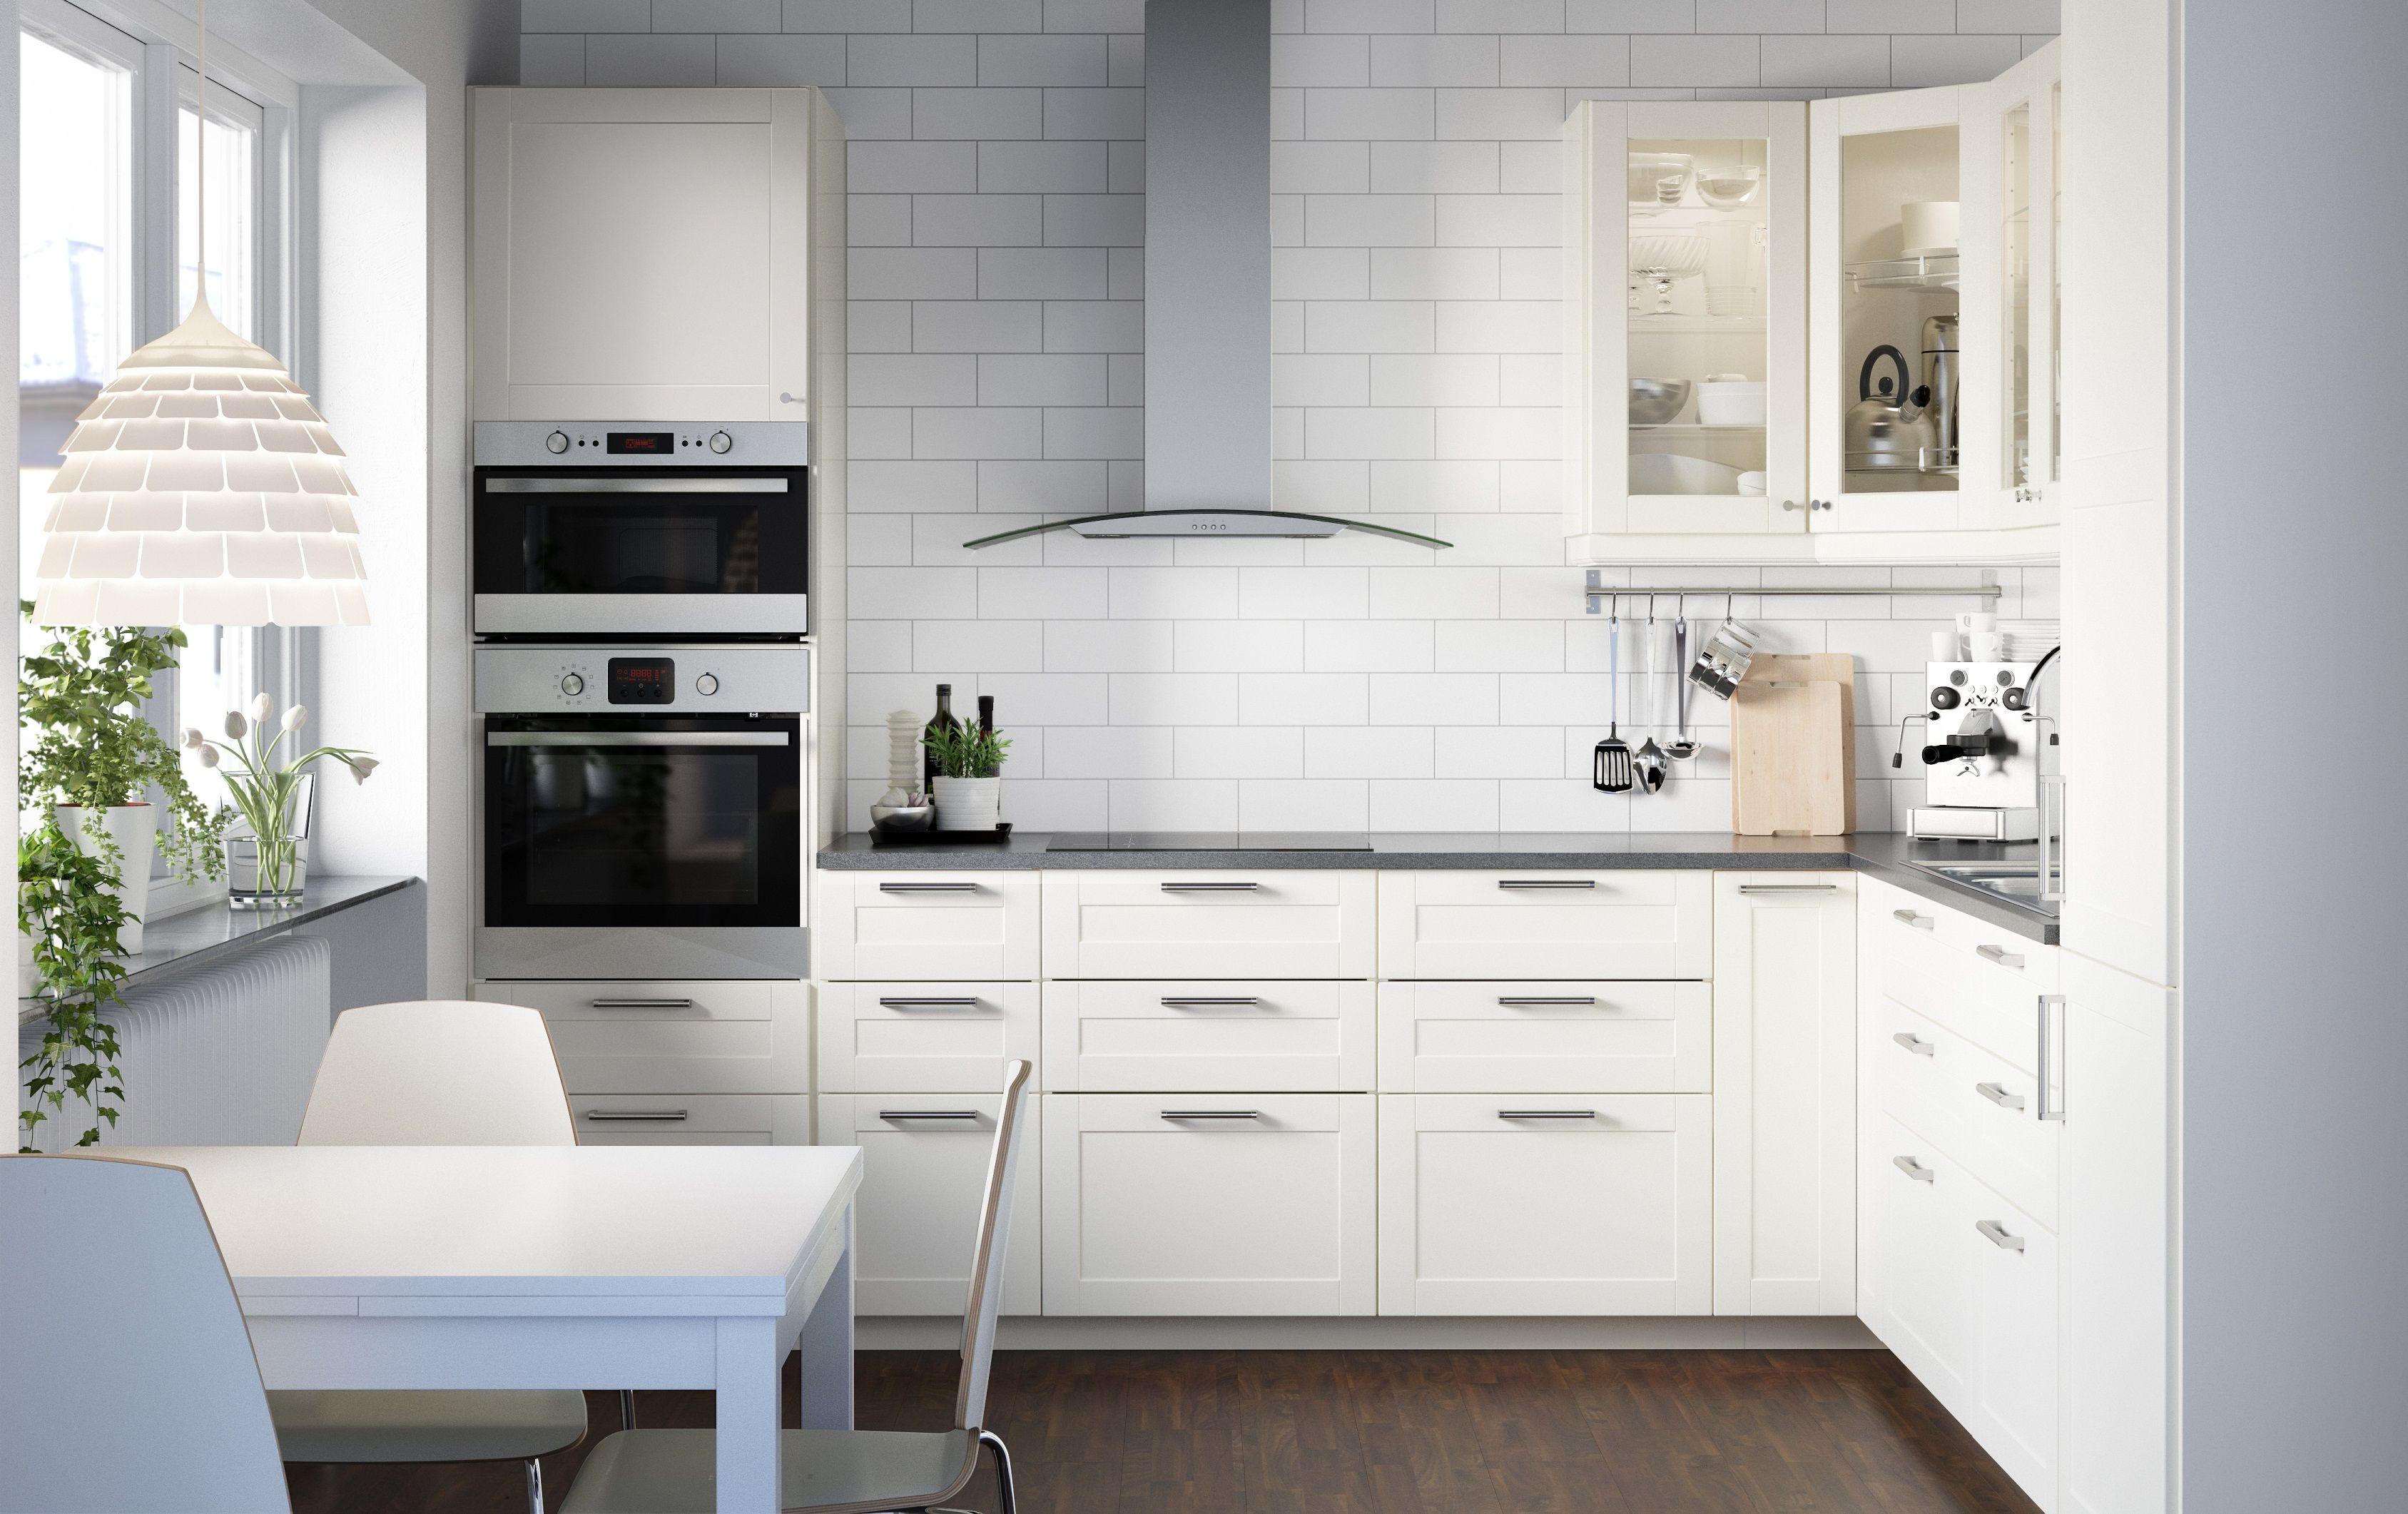 IKEA METOD SAVEDAL | life. | Pinterest | Kitchens, Kitchen handles ...